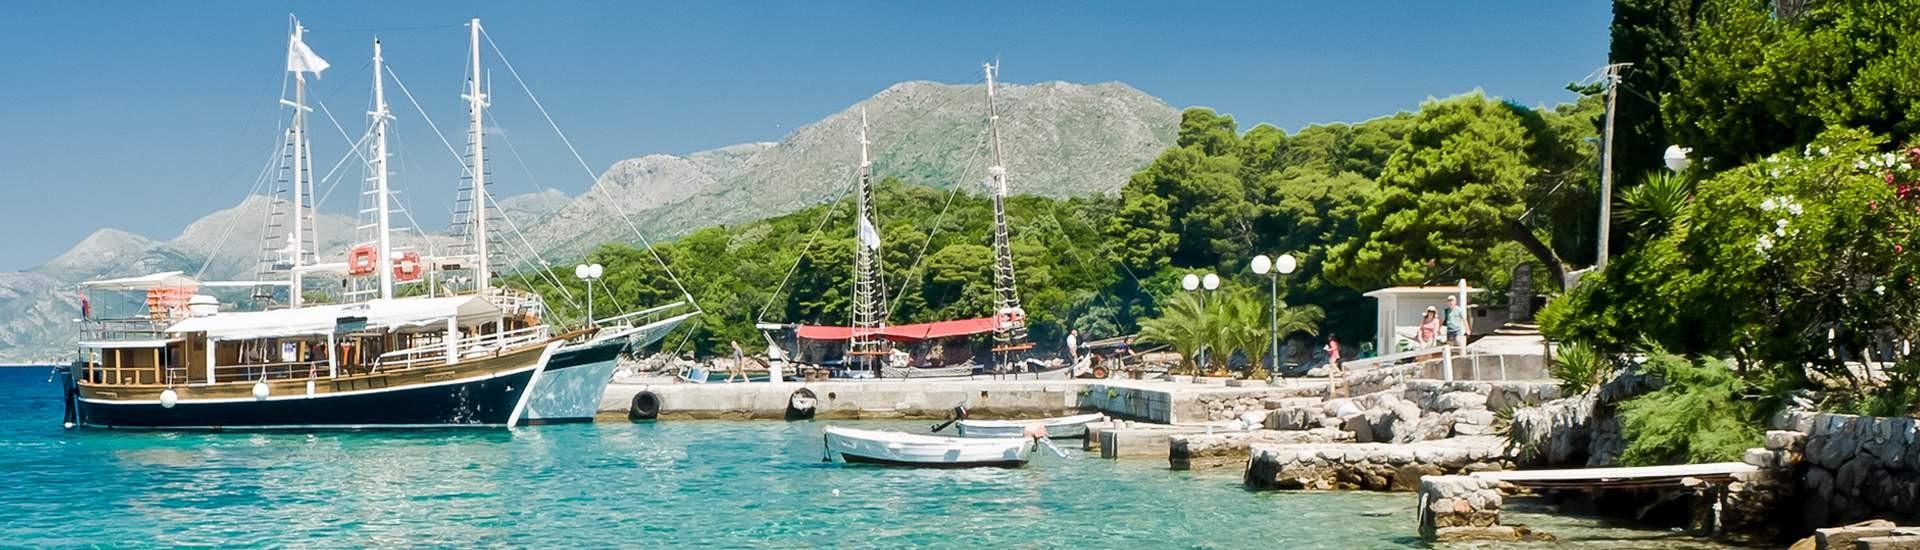 Croatia Gullets rent